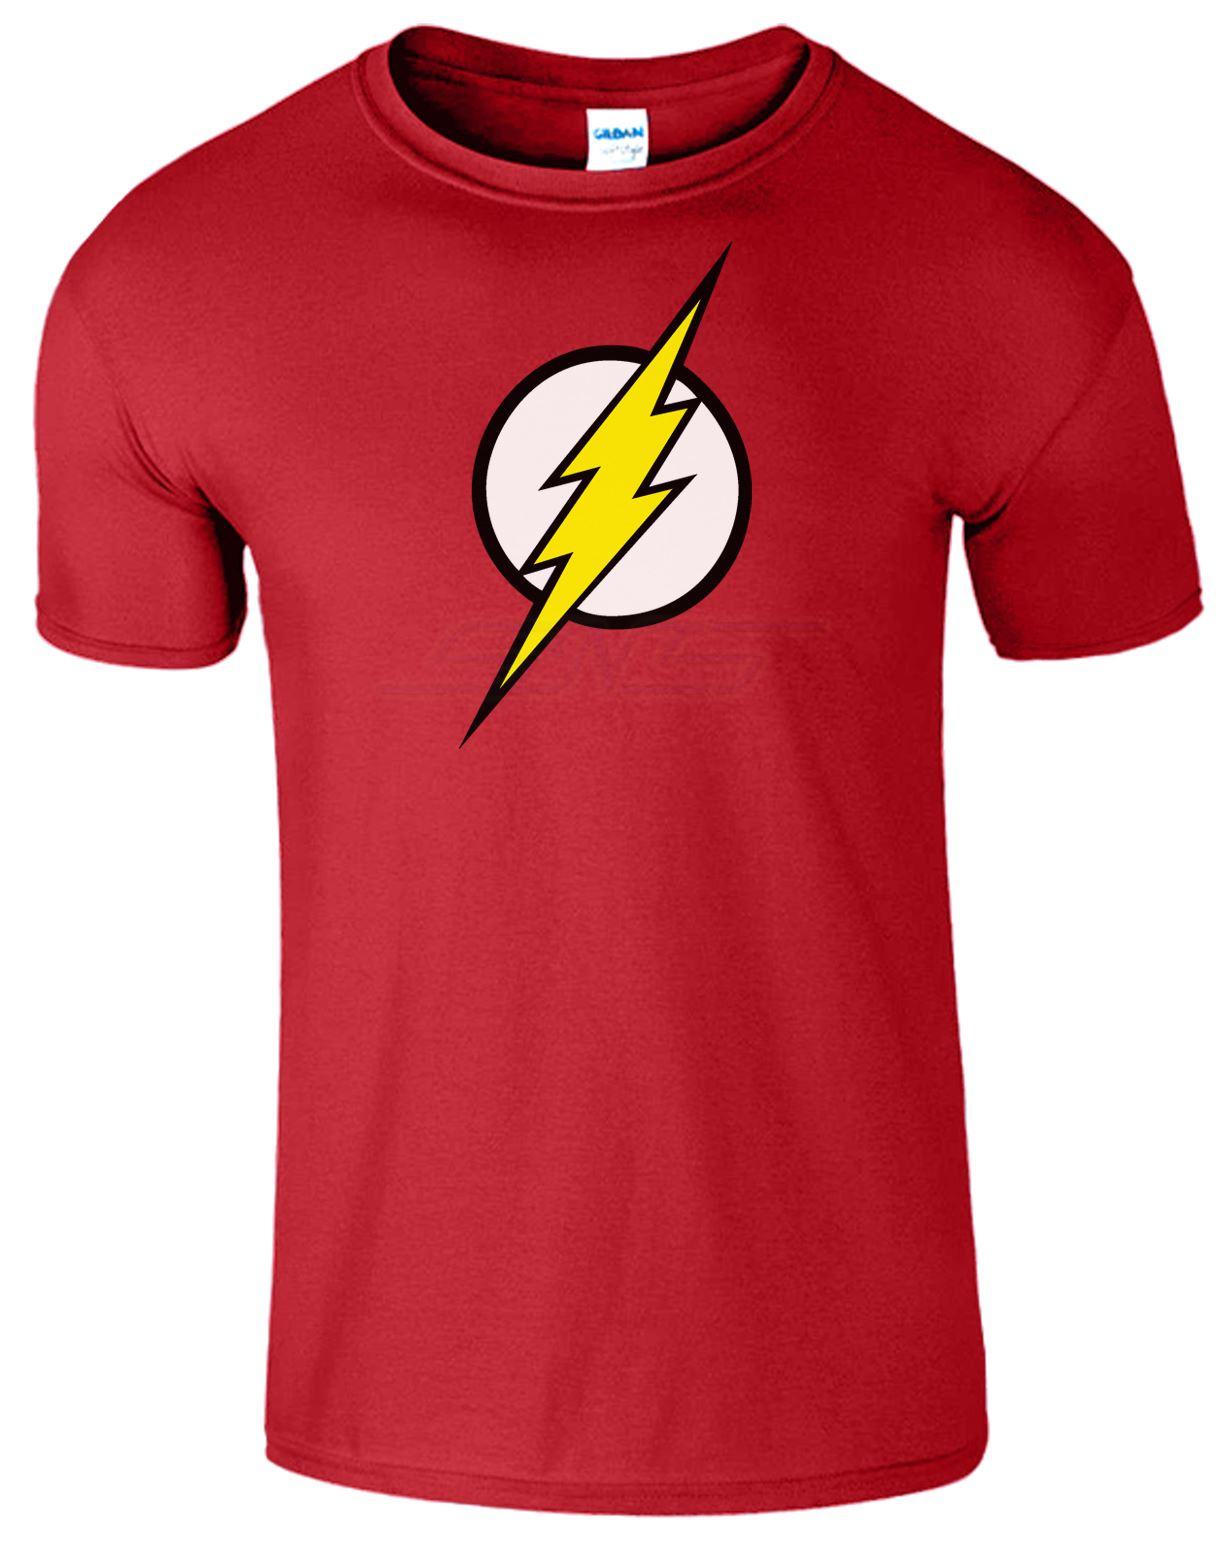 Men Boys Unisex Flash Super Hero Bazinga T-shirt Tee Top T Shirt XS S M L XL XXL